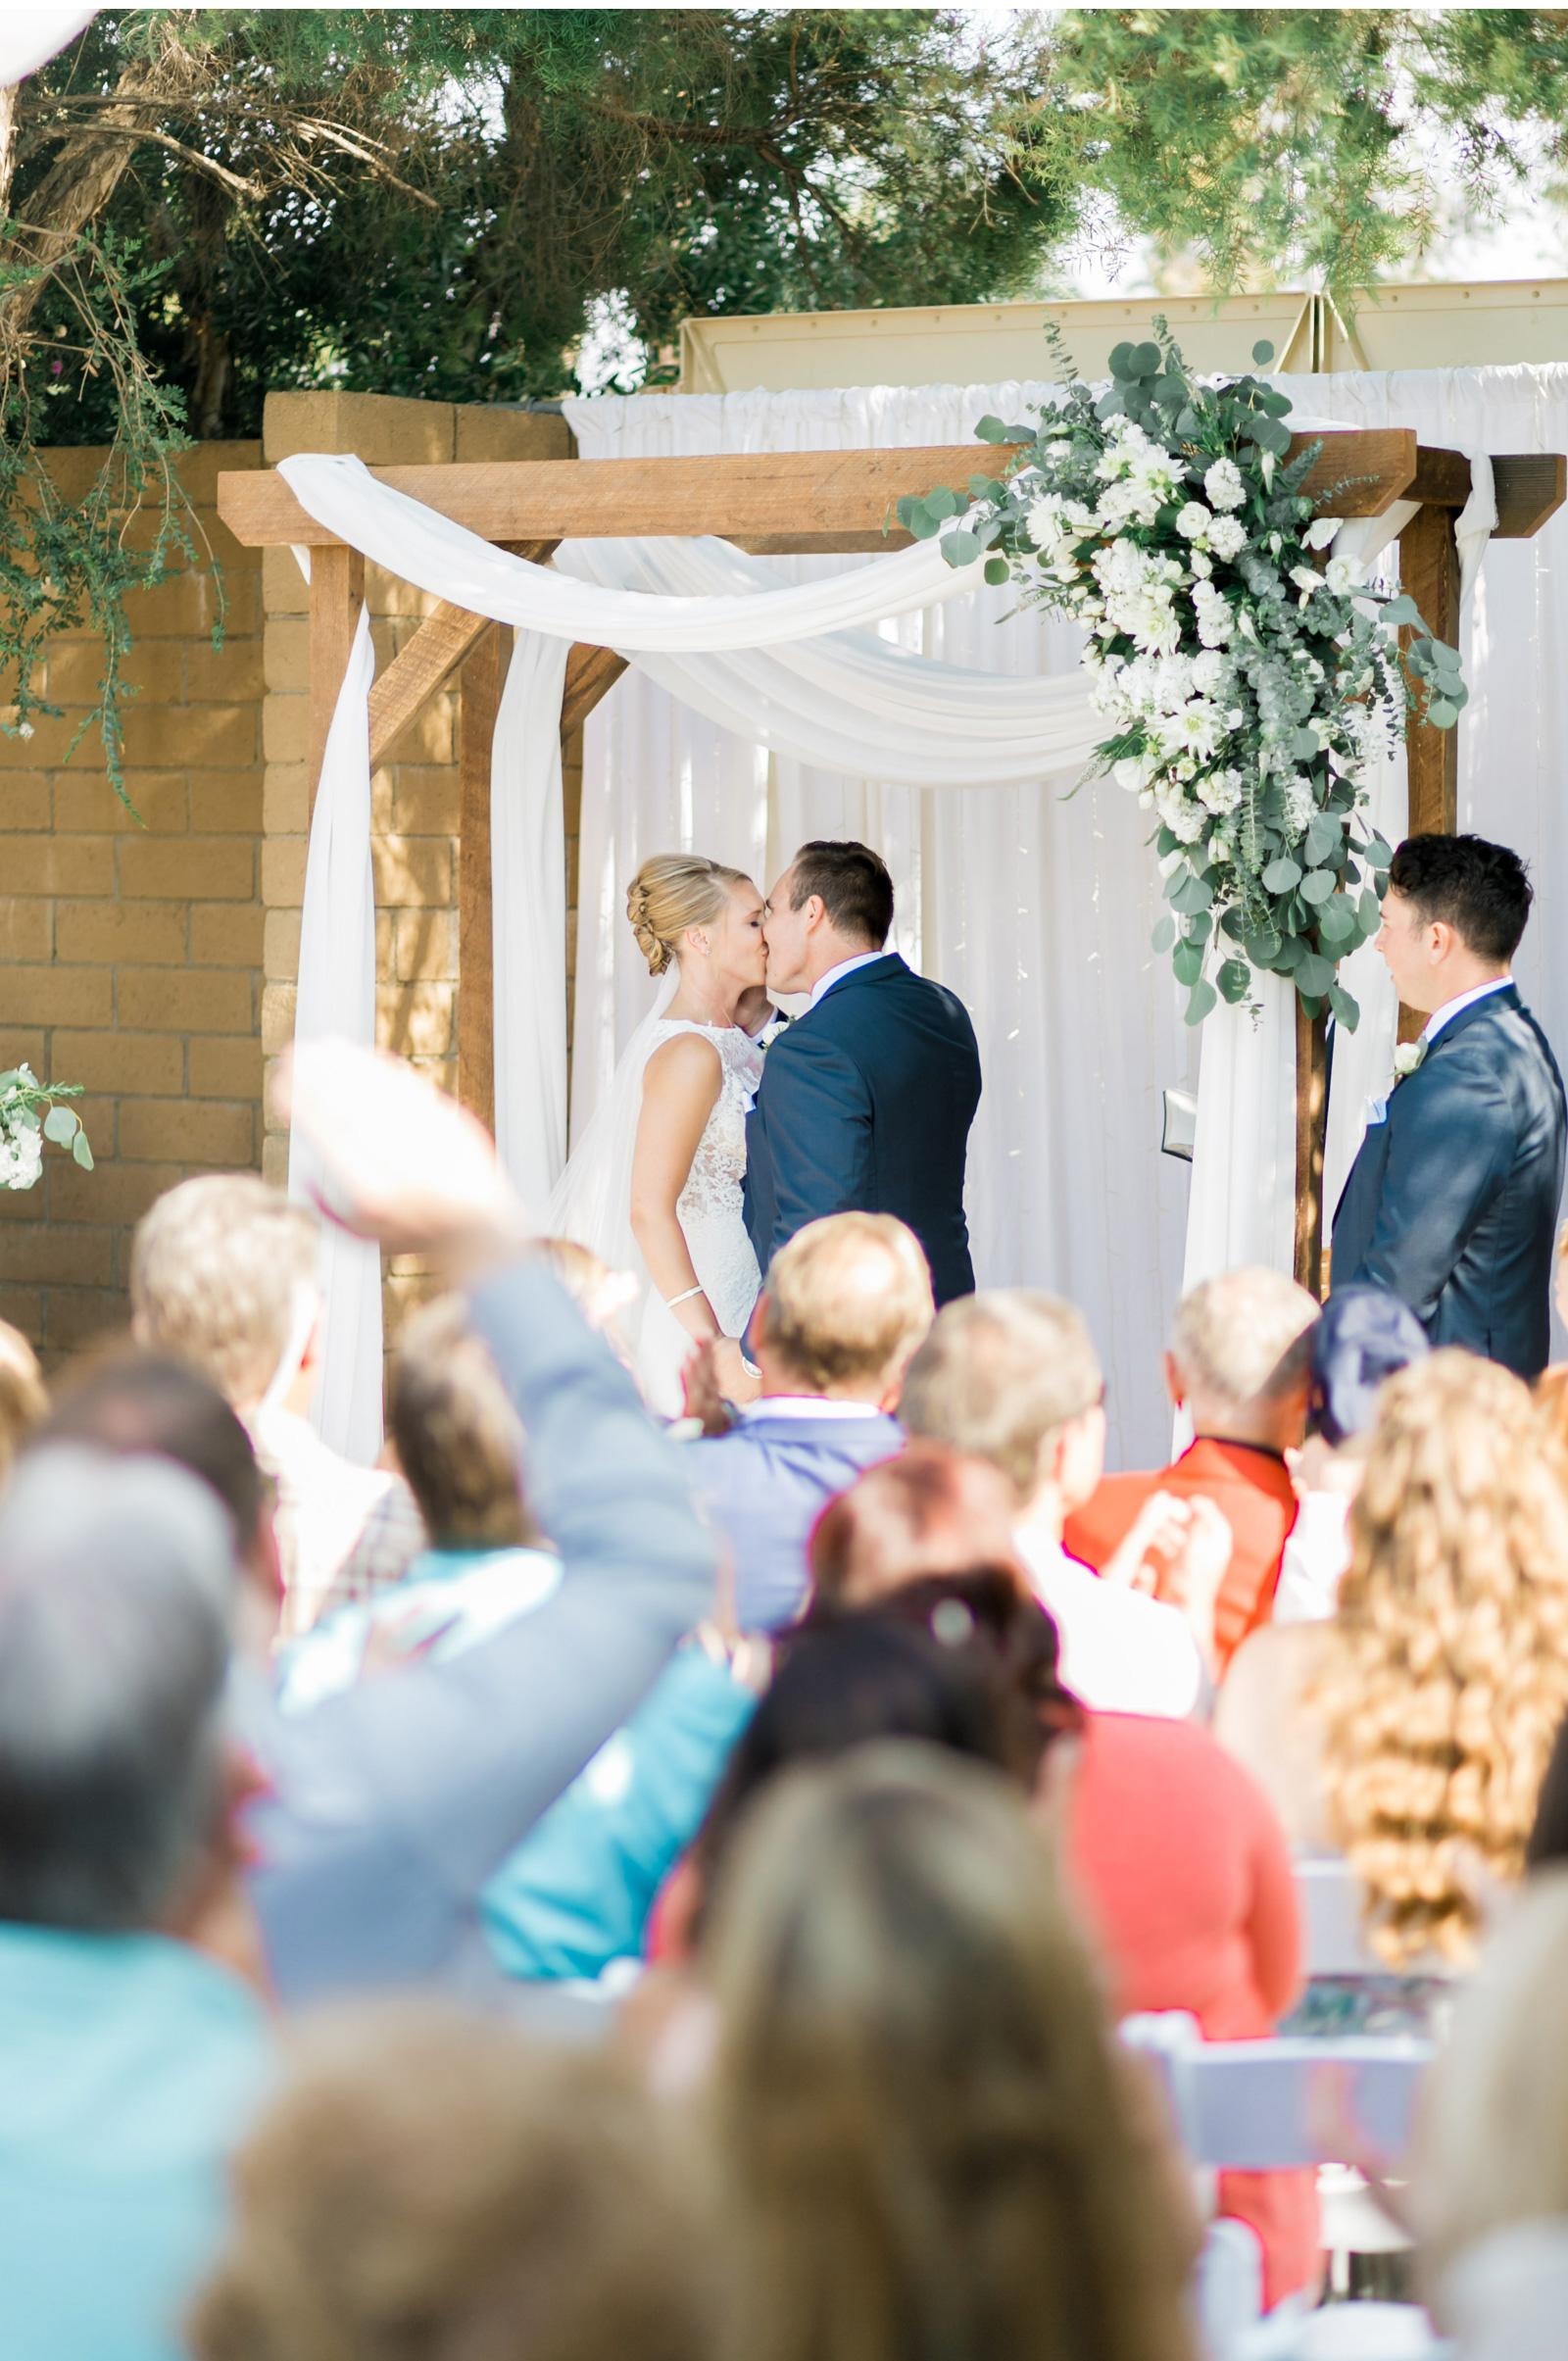 San-Luis-Obispo-Wedding-Photographer-Natalie-Schutt-Photography-Style-Me-Pretty_11.jpg